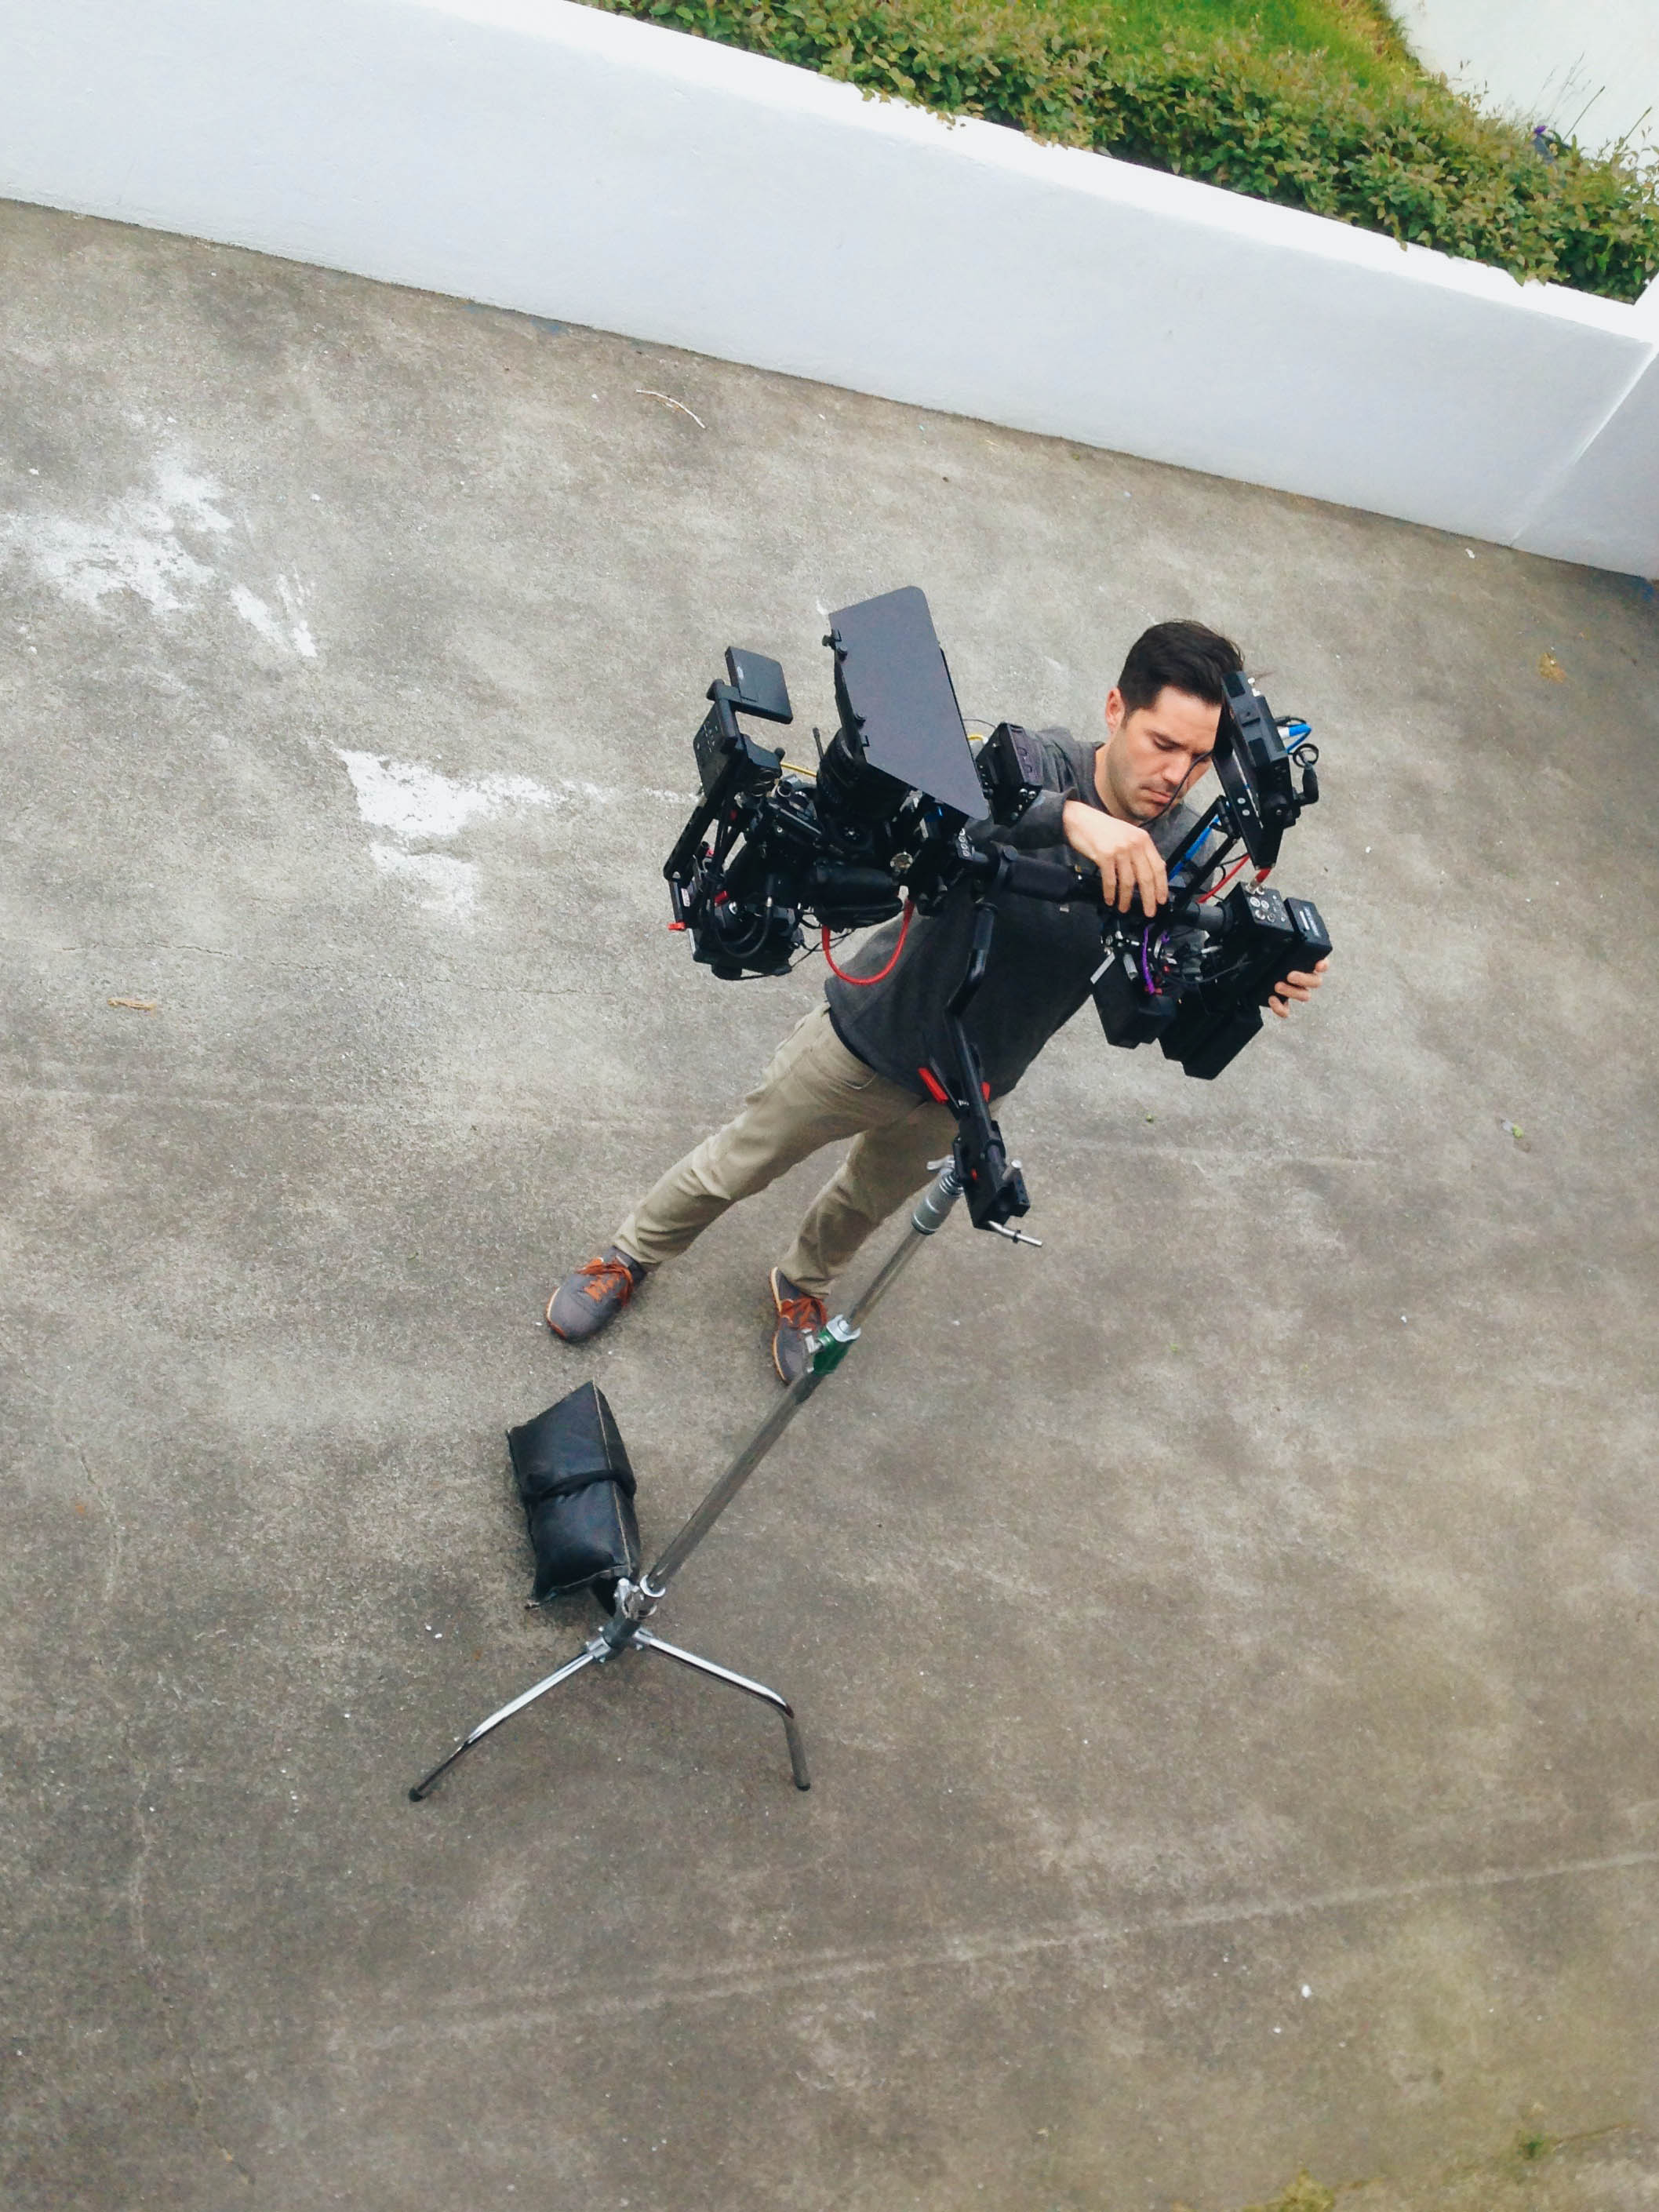 joe, director of photography